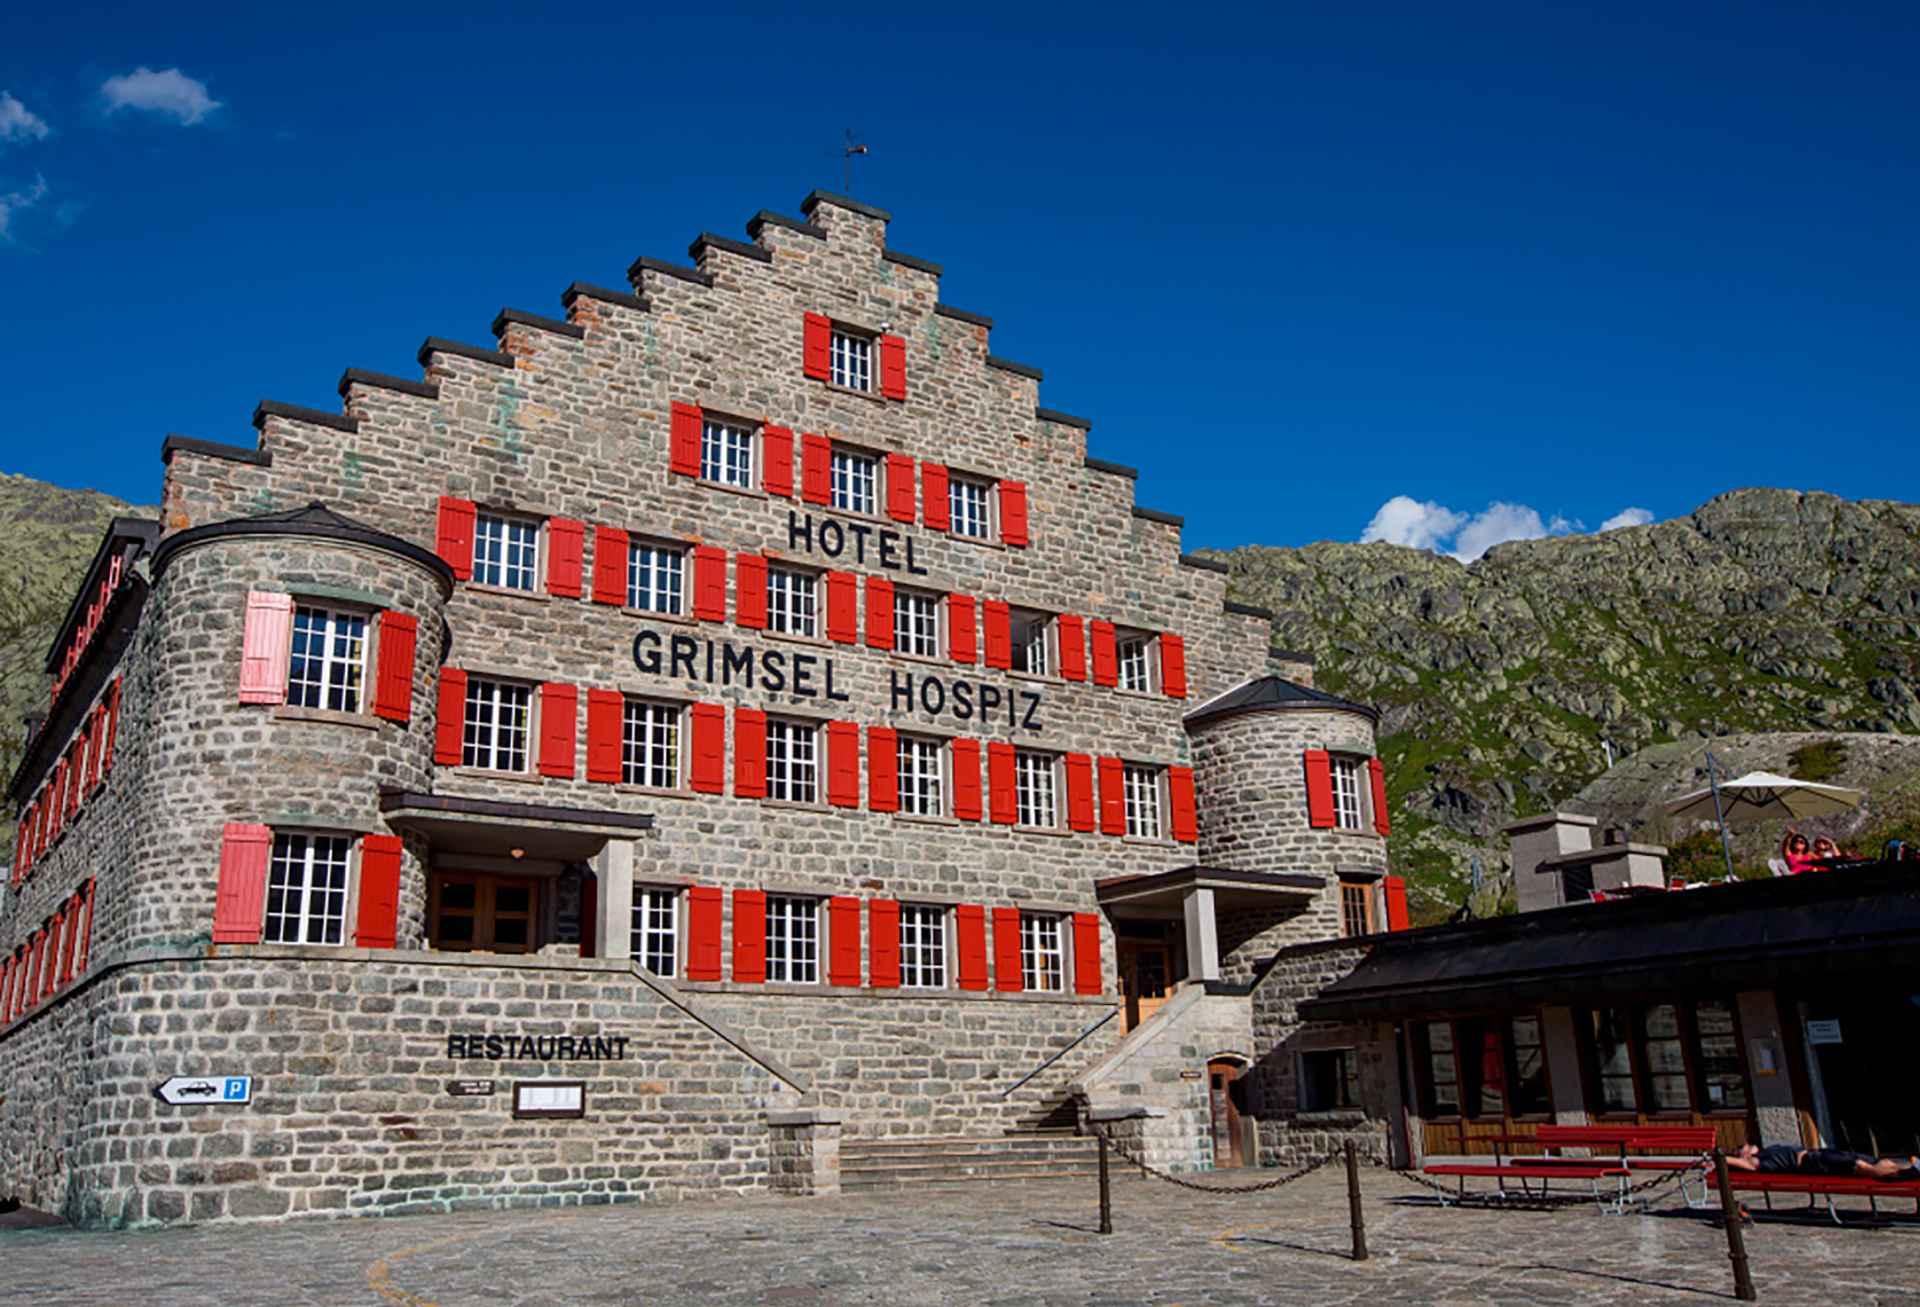 Grimselwelt: Kwo Hospiz Hotel Grimselpass Kraftwerke Oberhasli Grimselsee Haslital Oberhasli